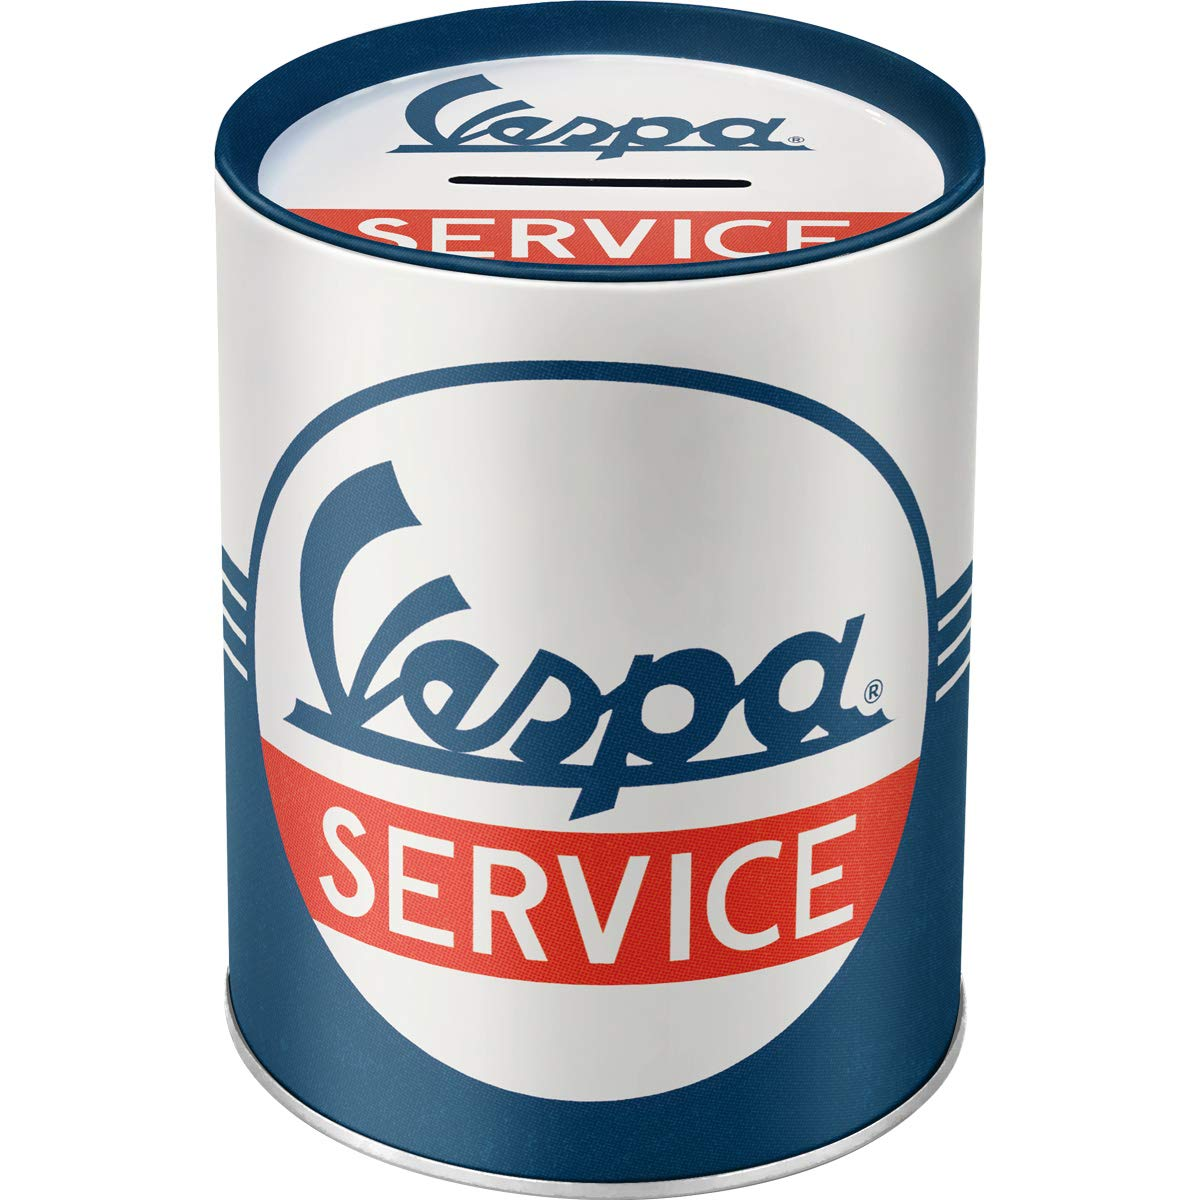 Nostalgic-Art Vespa Service